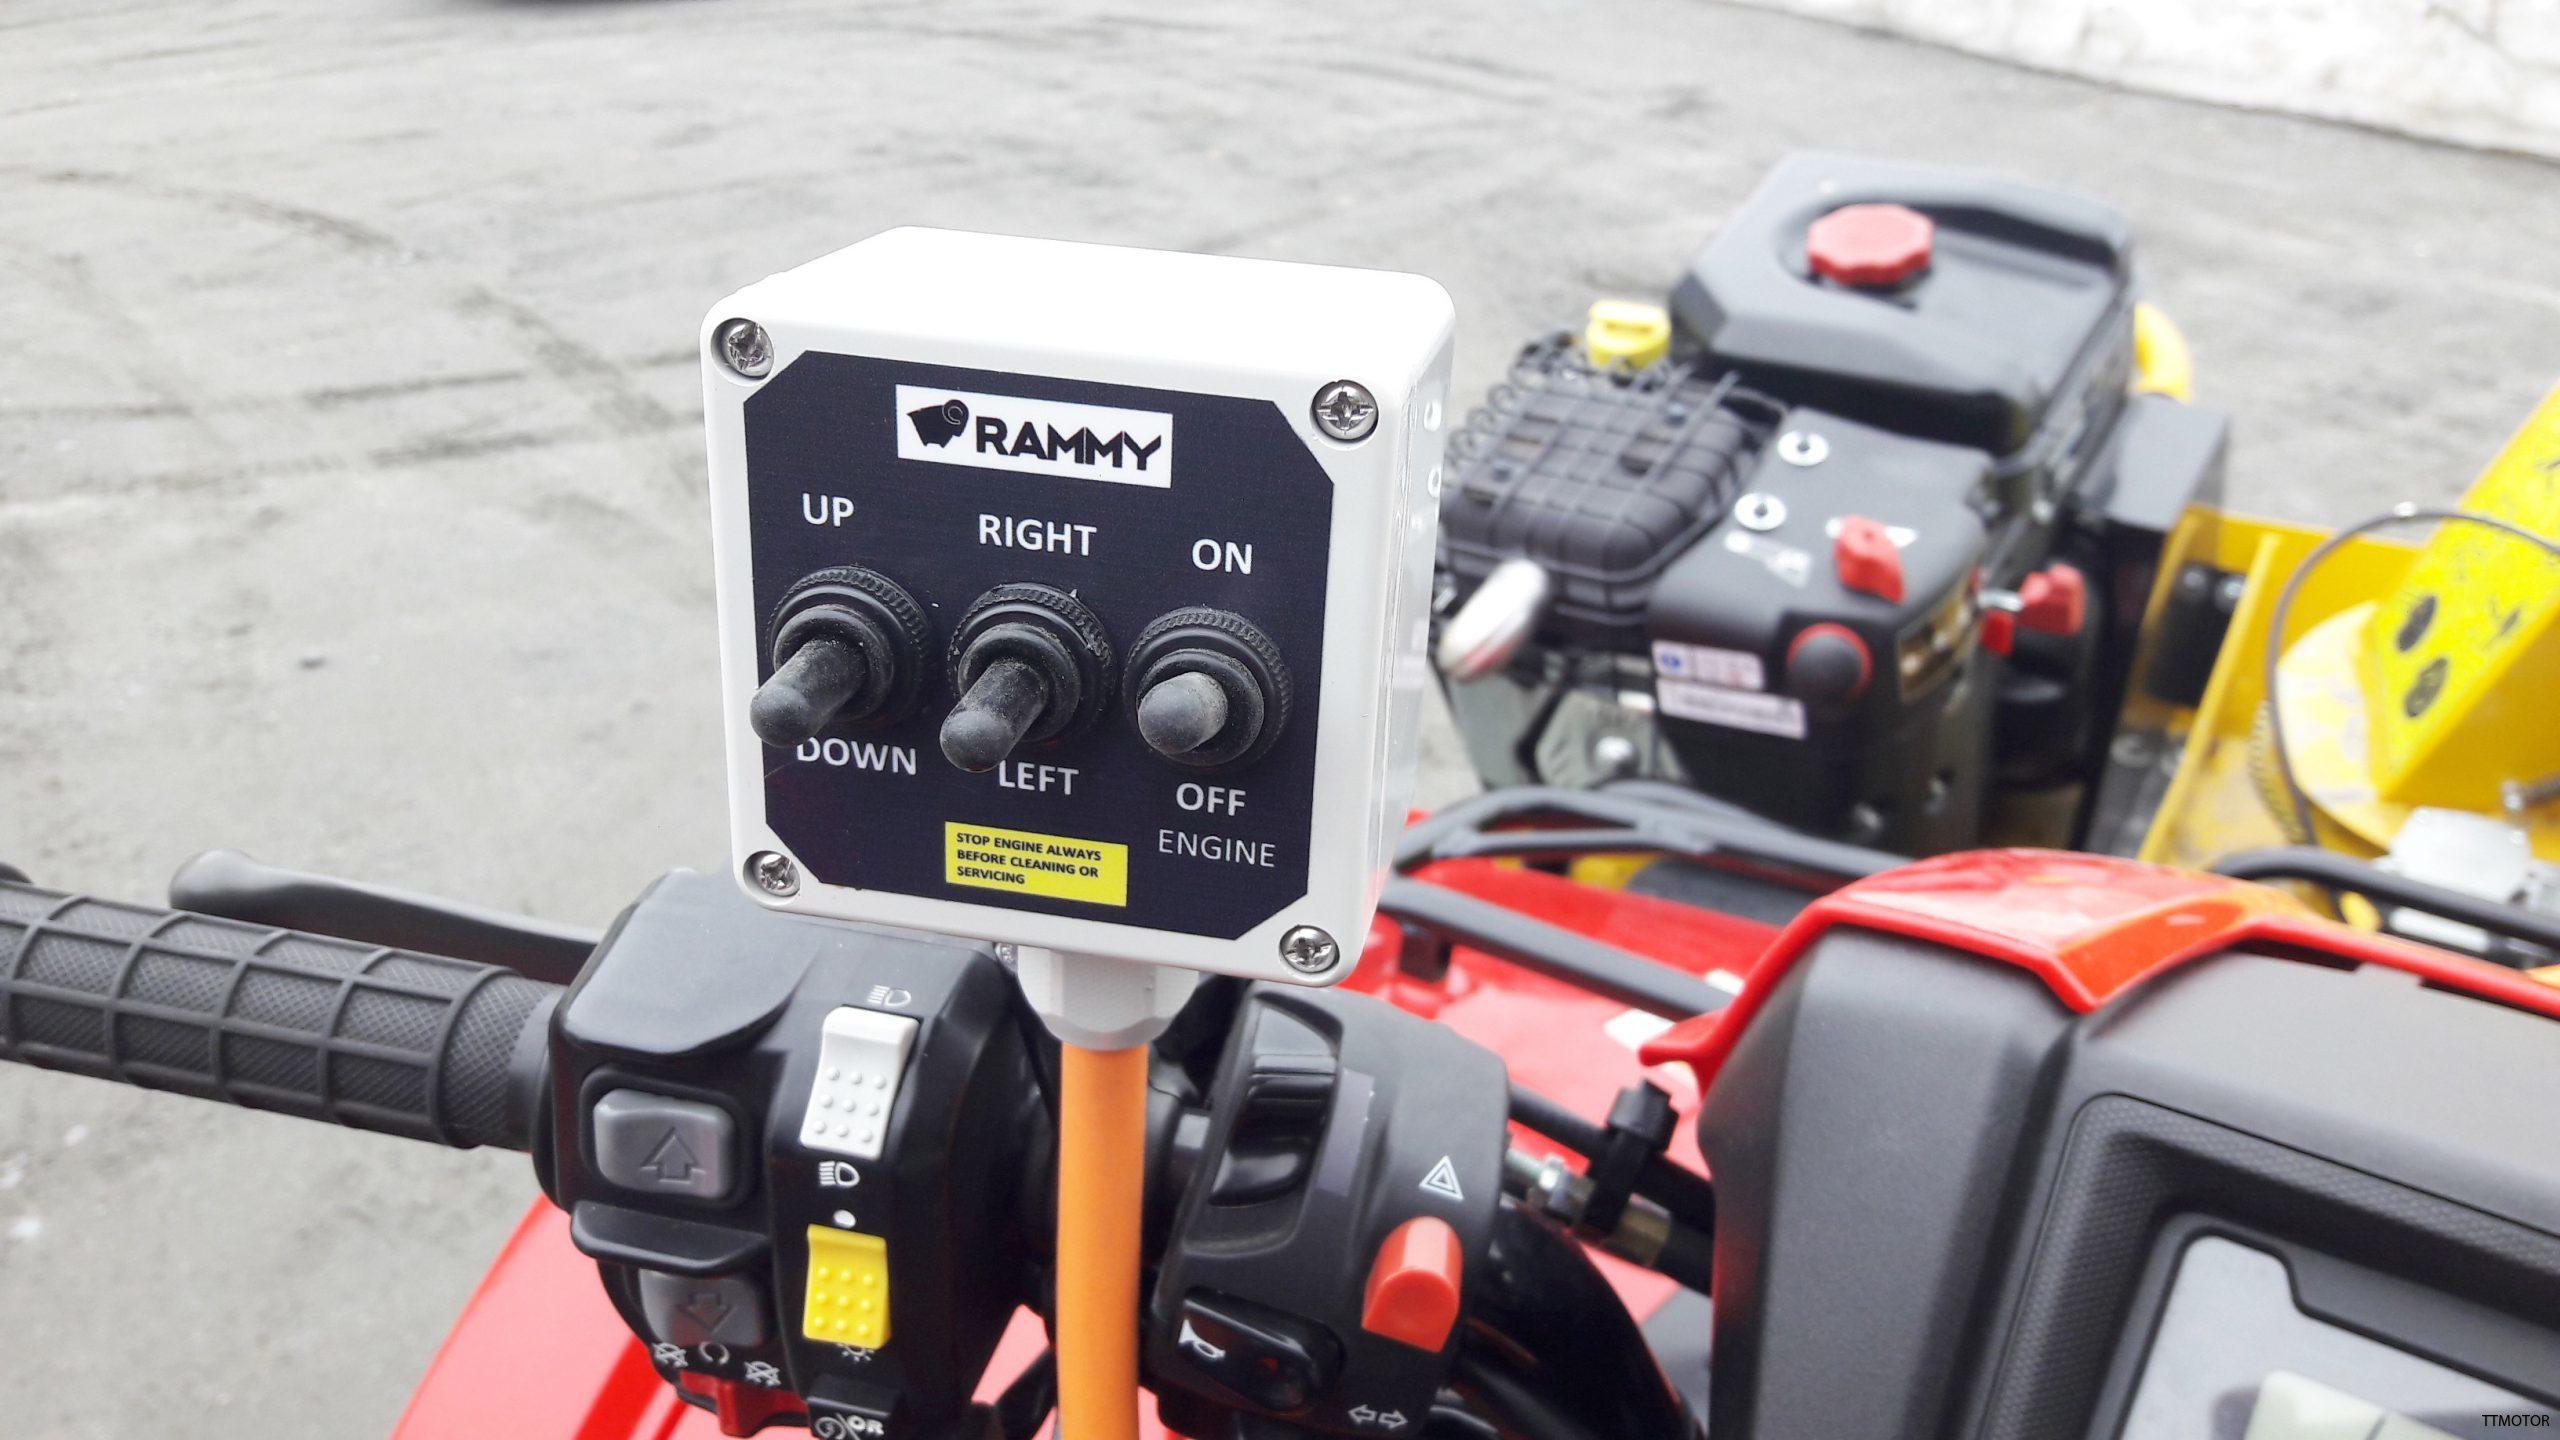 Rammy-Snowblower-EC-120-ATV-2019-1